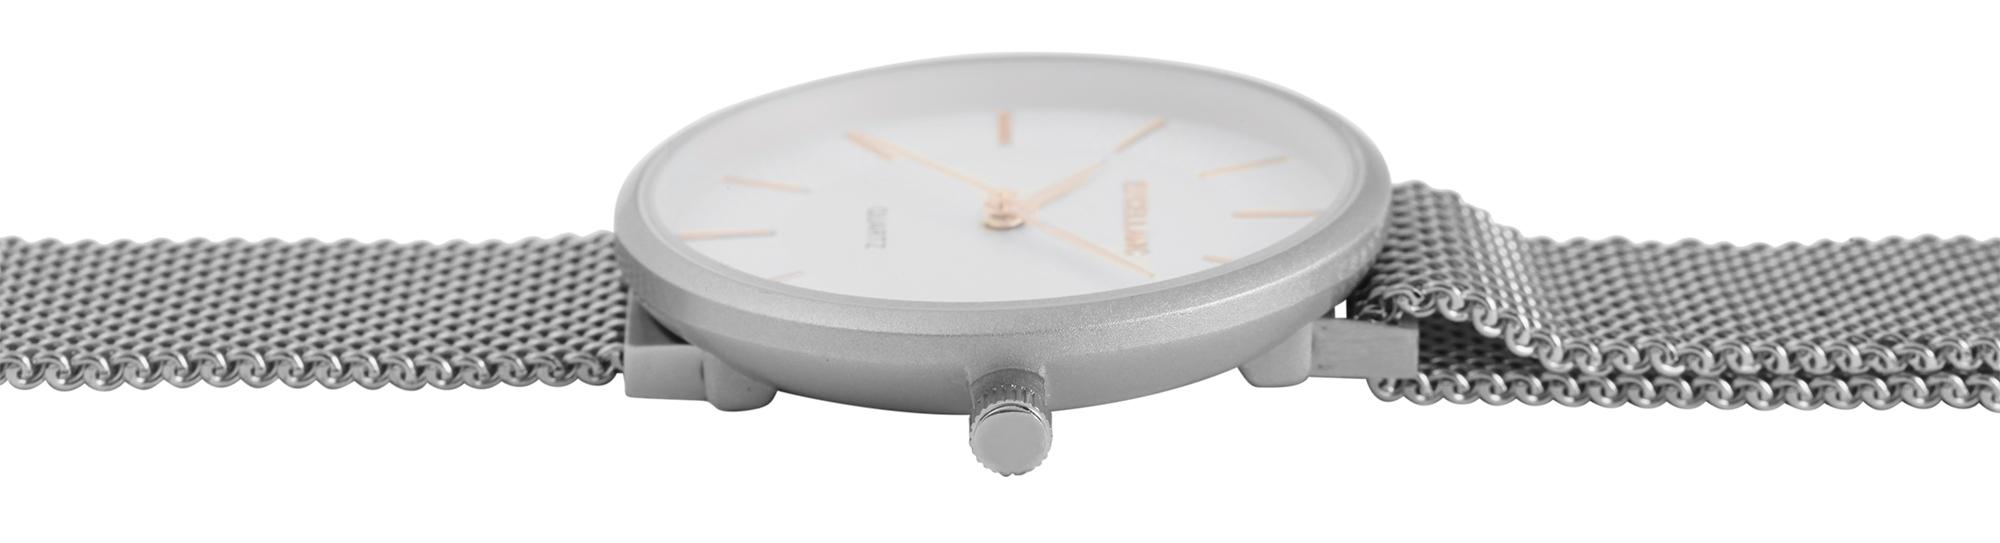 Damenuhr Excellanc Armbanduhr Meshband Magnetverschluss silber